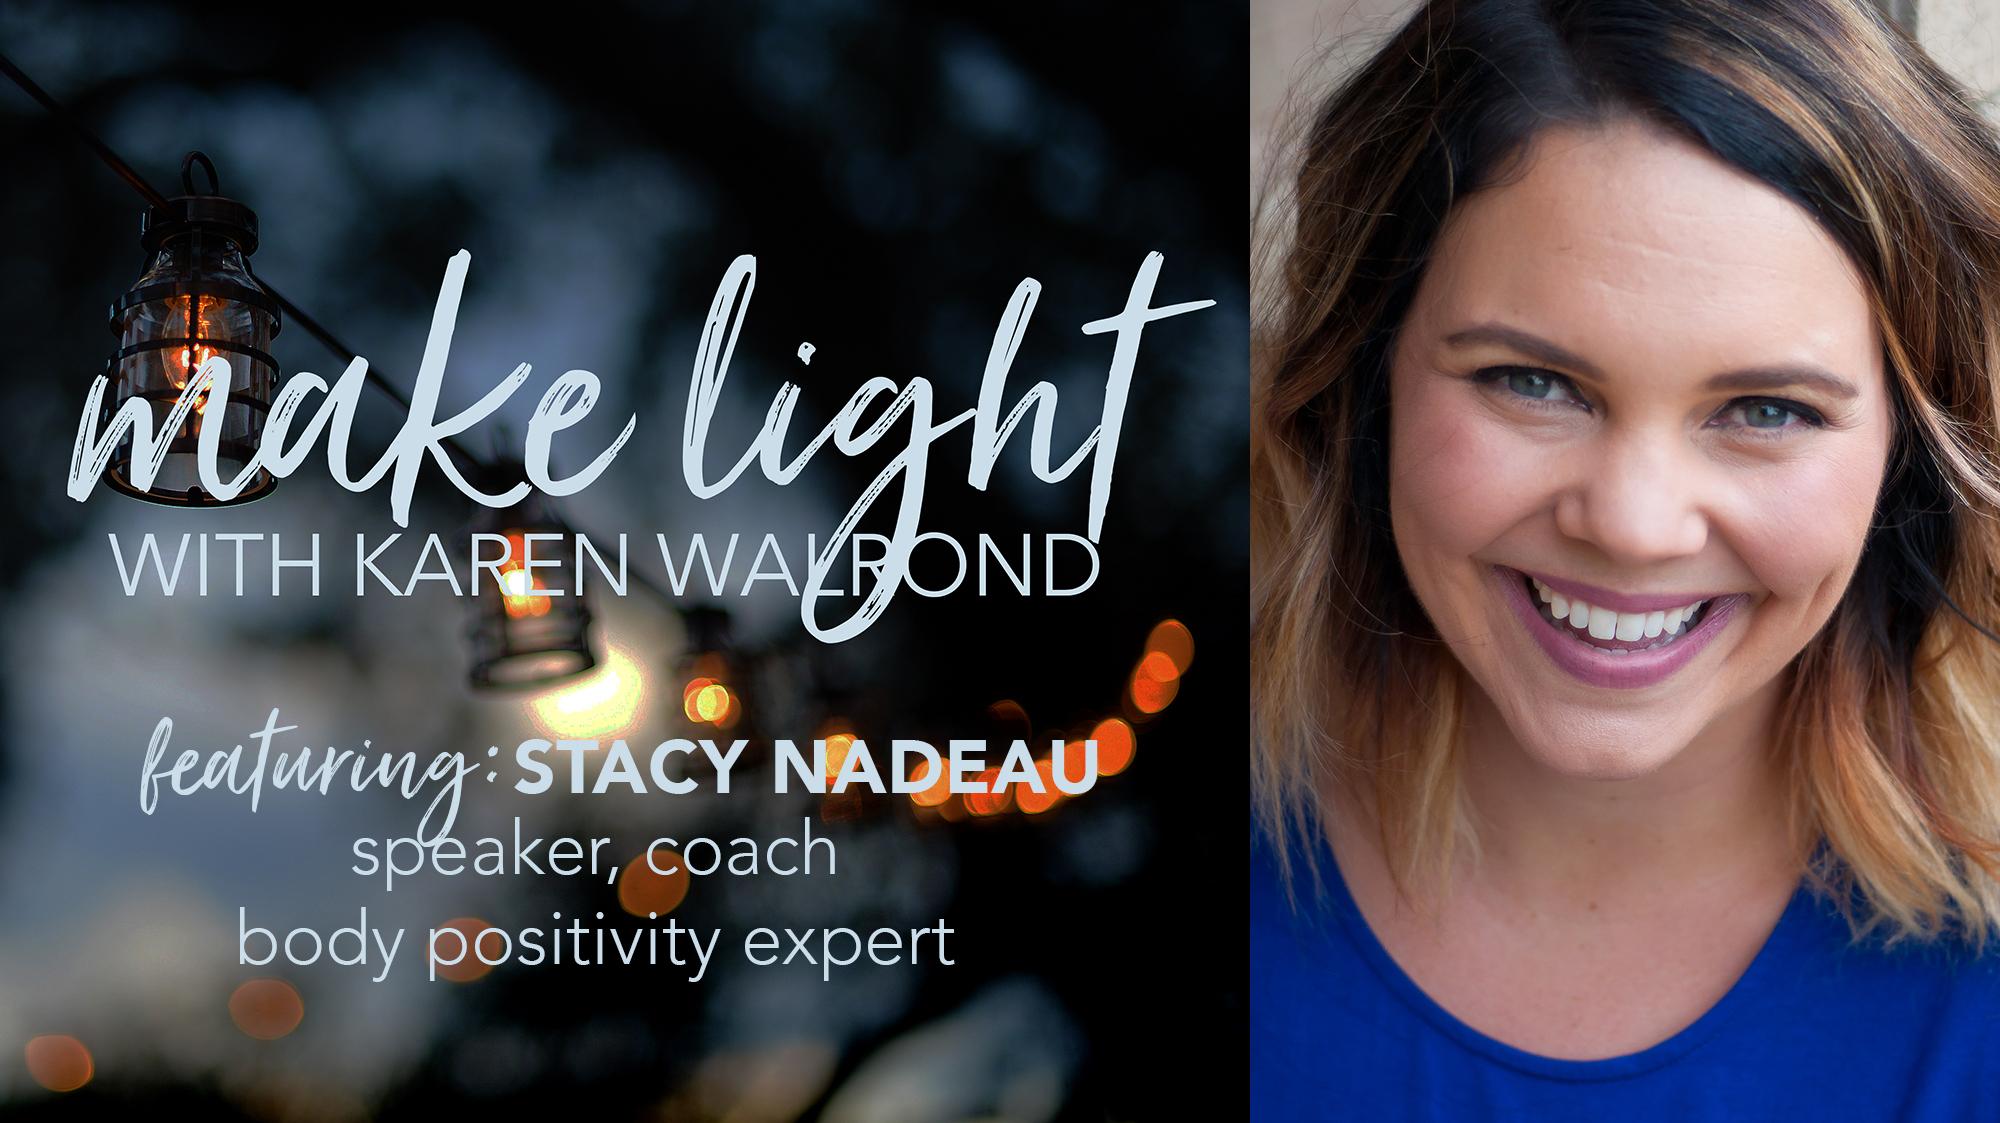 Karen Walrond leadership coach houston stacynadeaumakelight.jpg